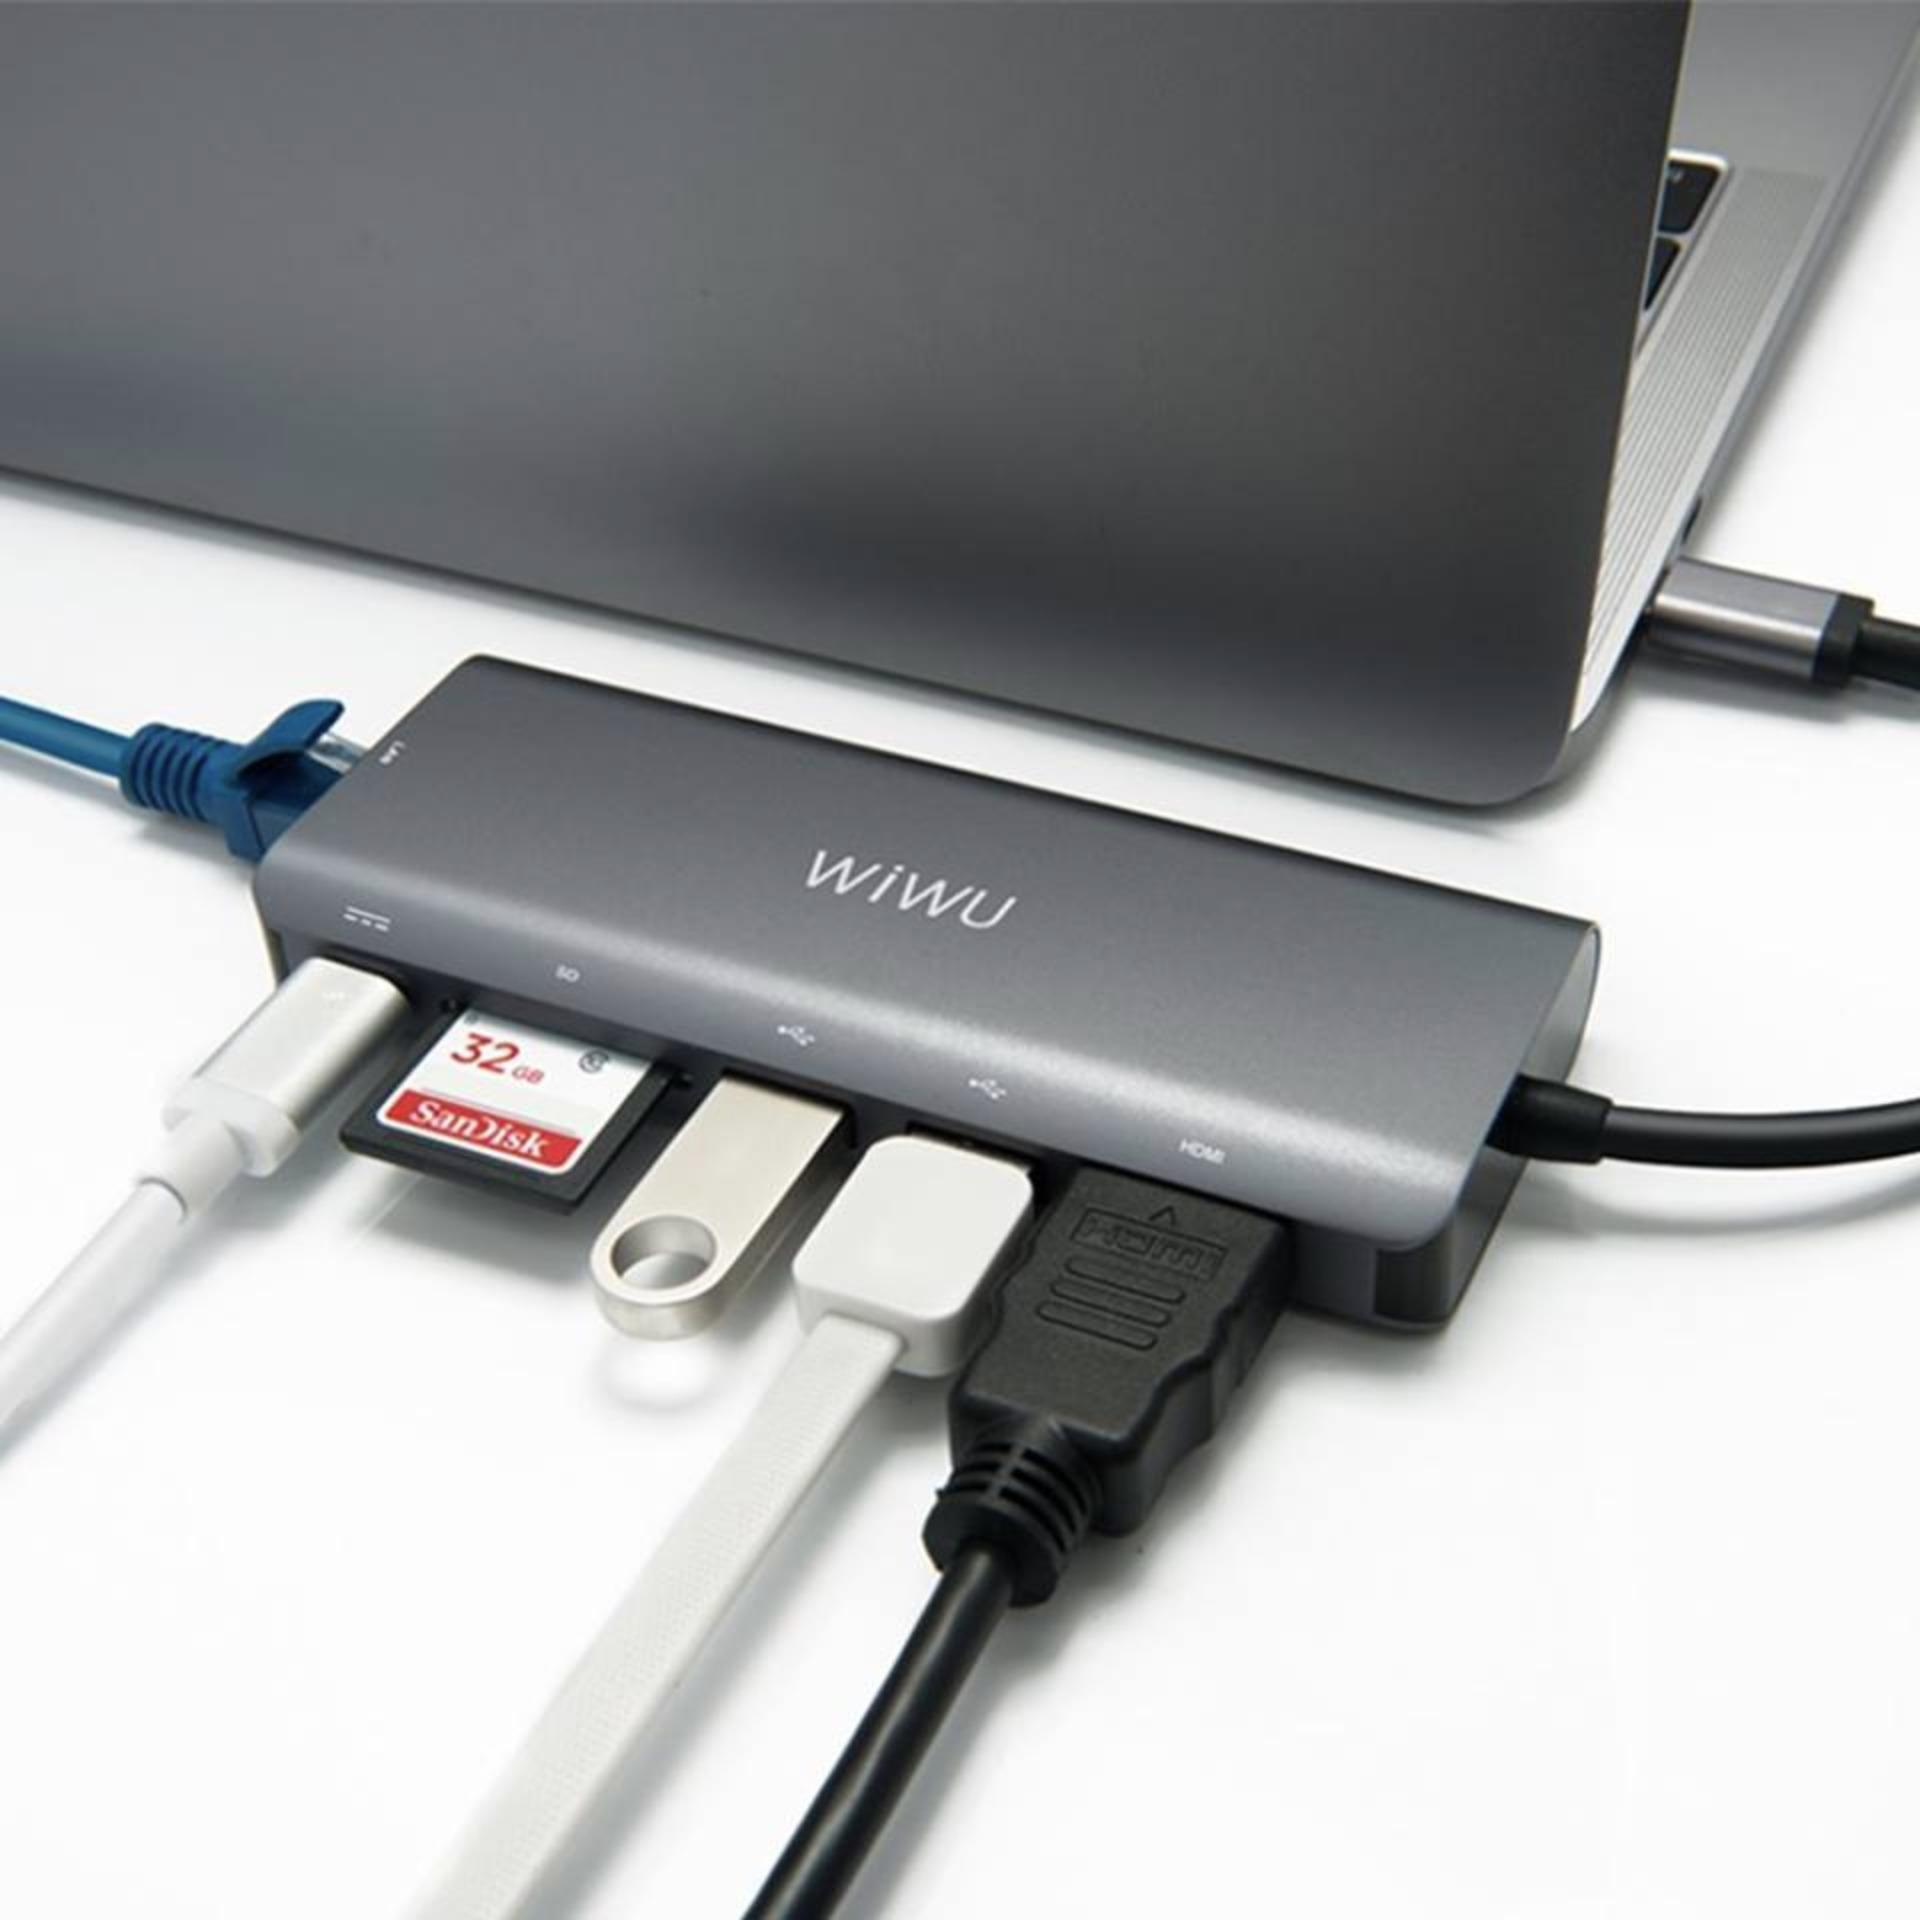 Cổng chia USB-C cho MacBook / Laptop hiệu WIWU 6 trong 1 (xám)